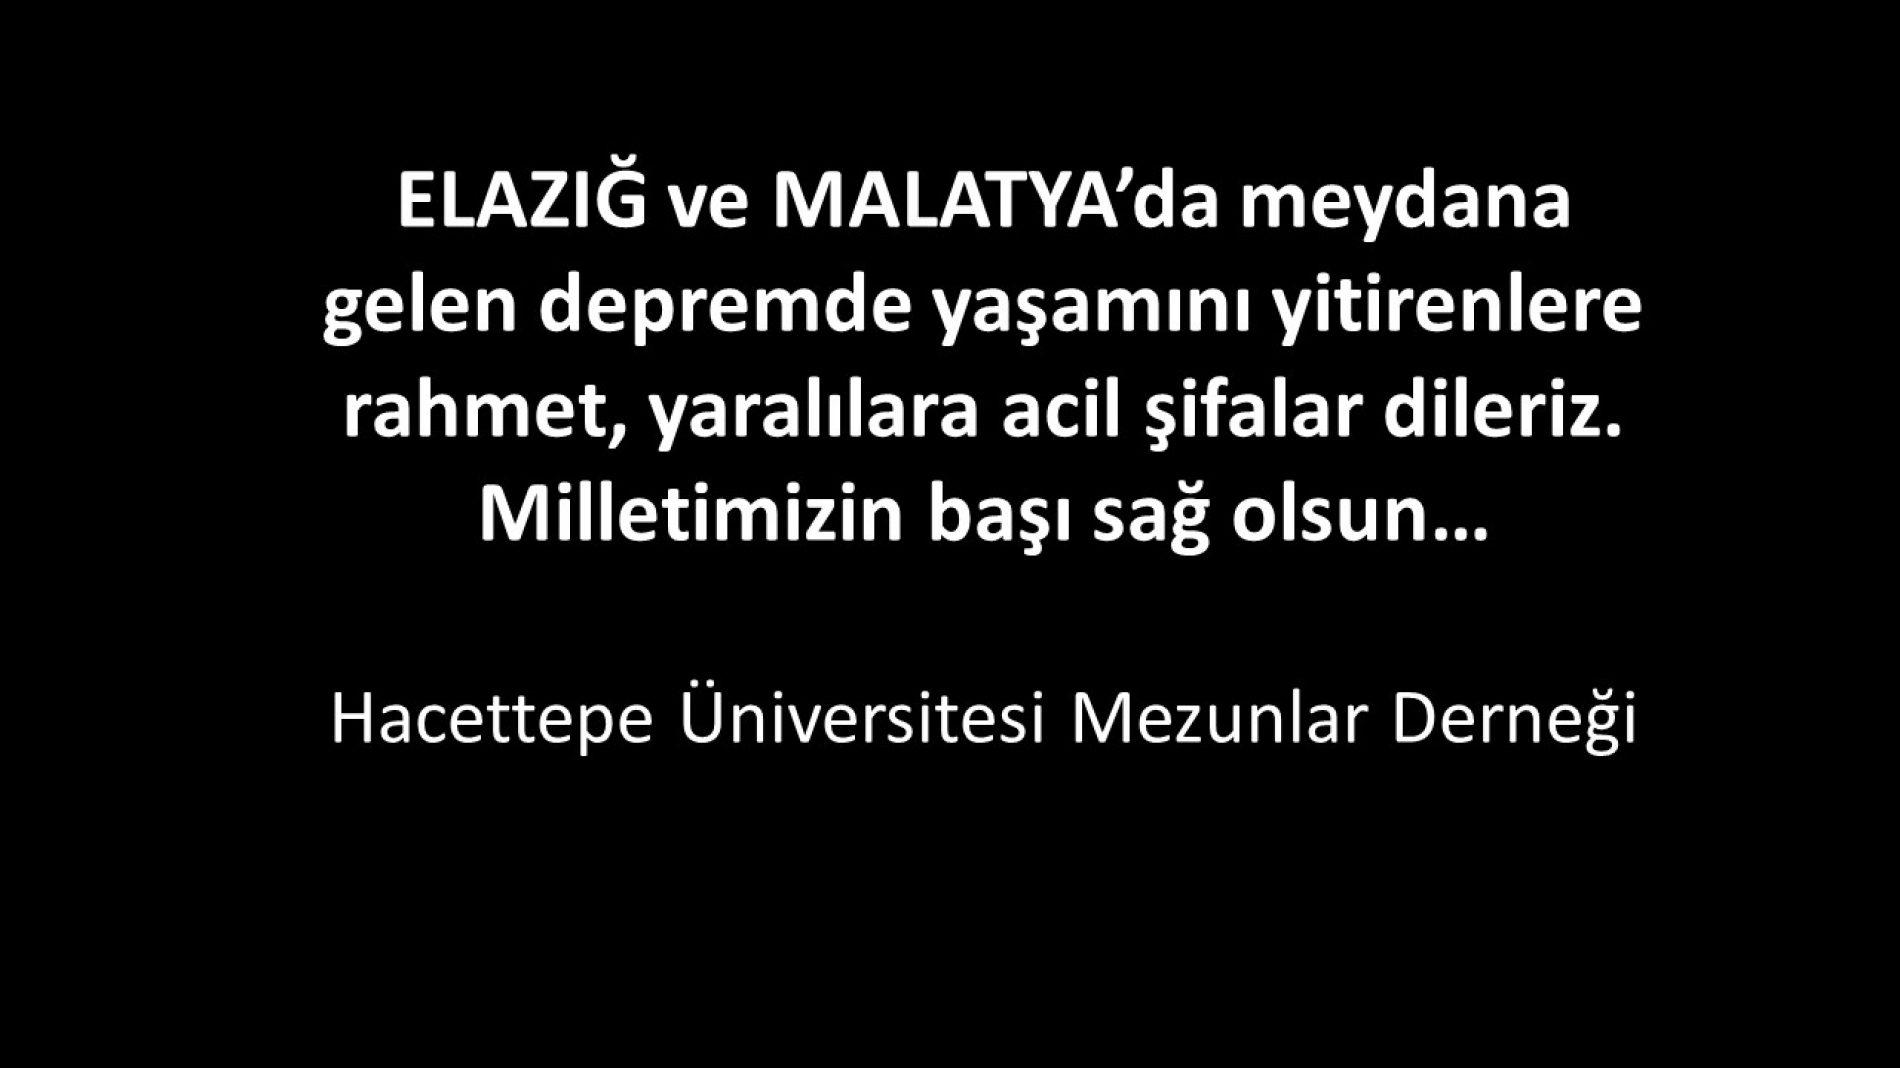 Elazığ – Malatya Depremi